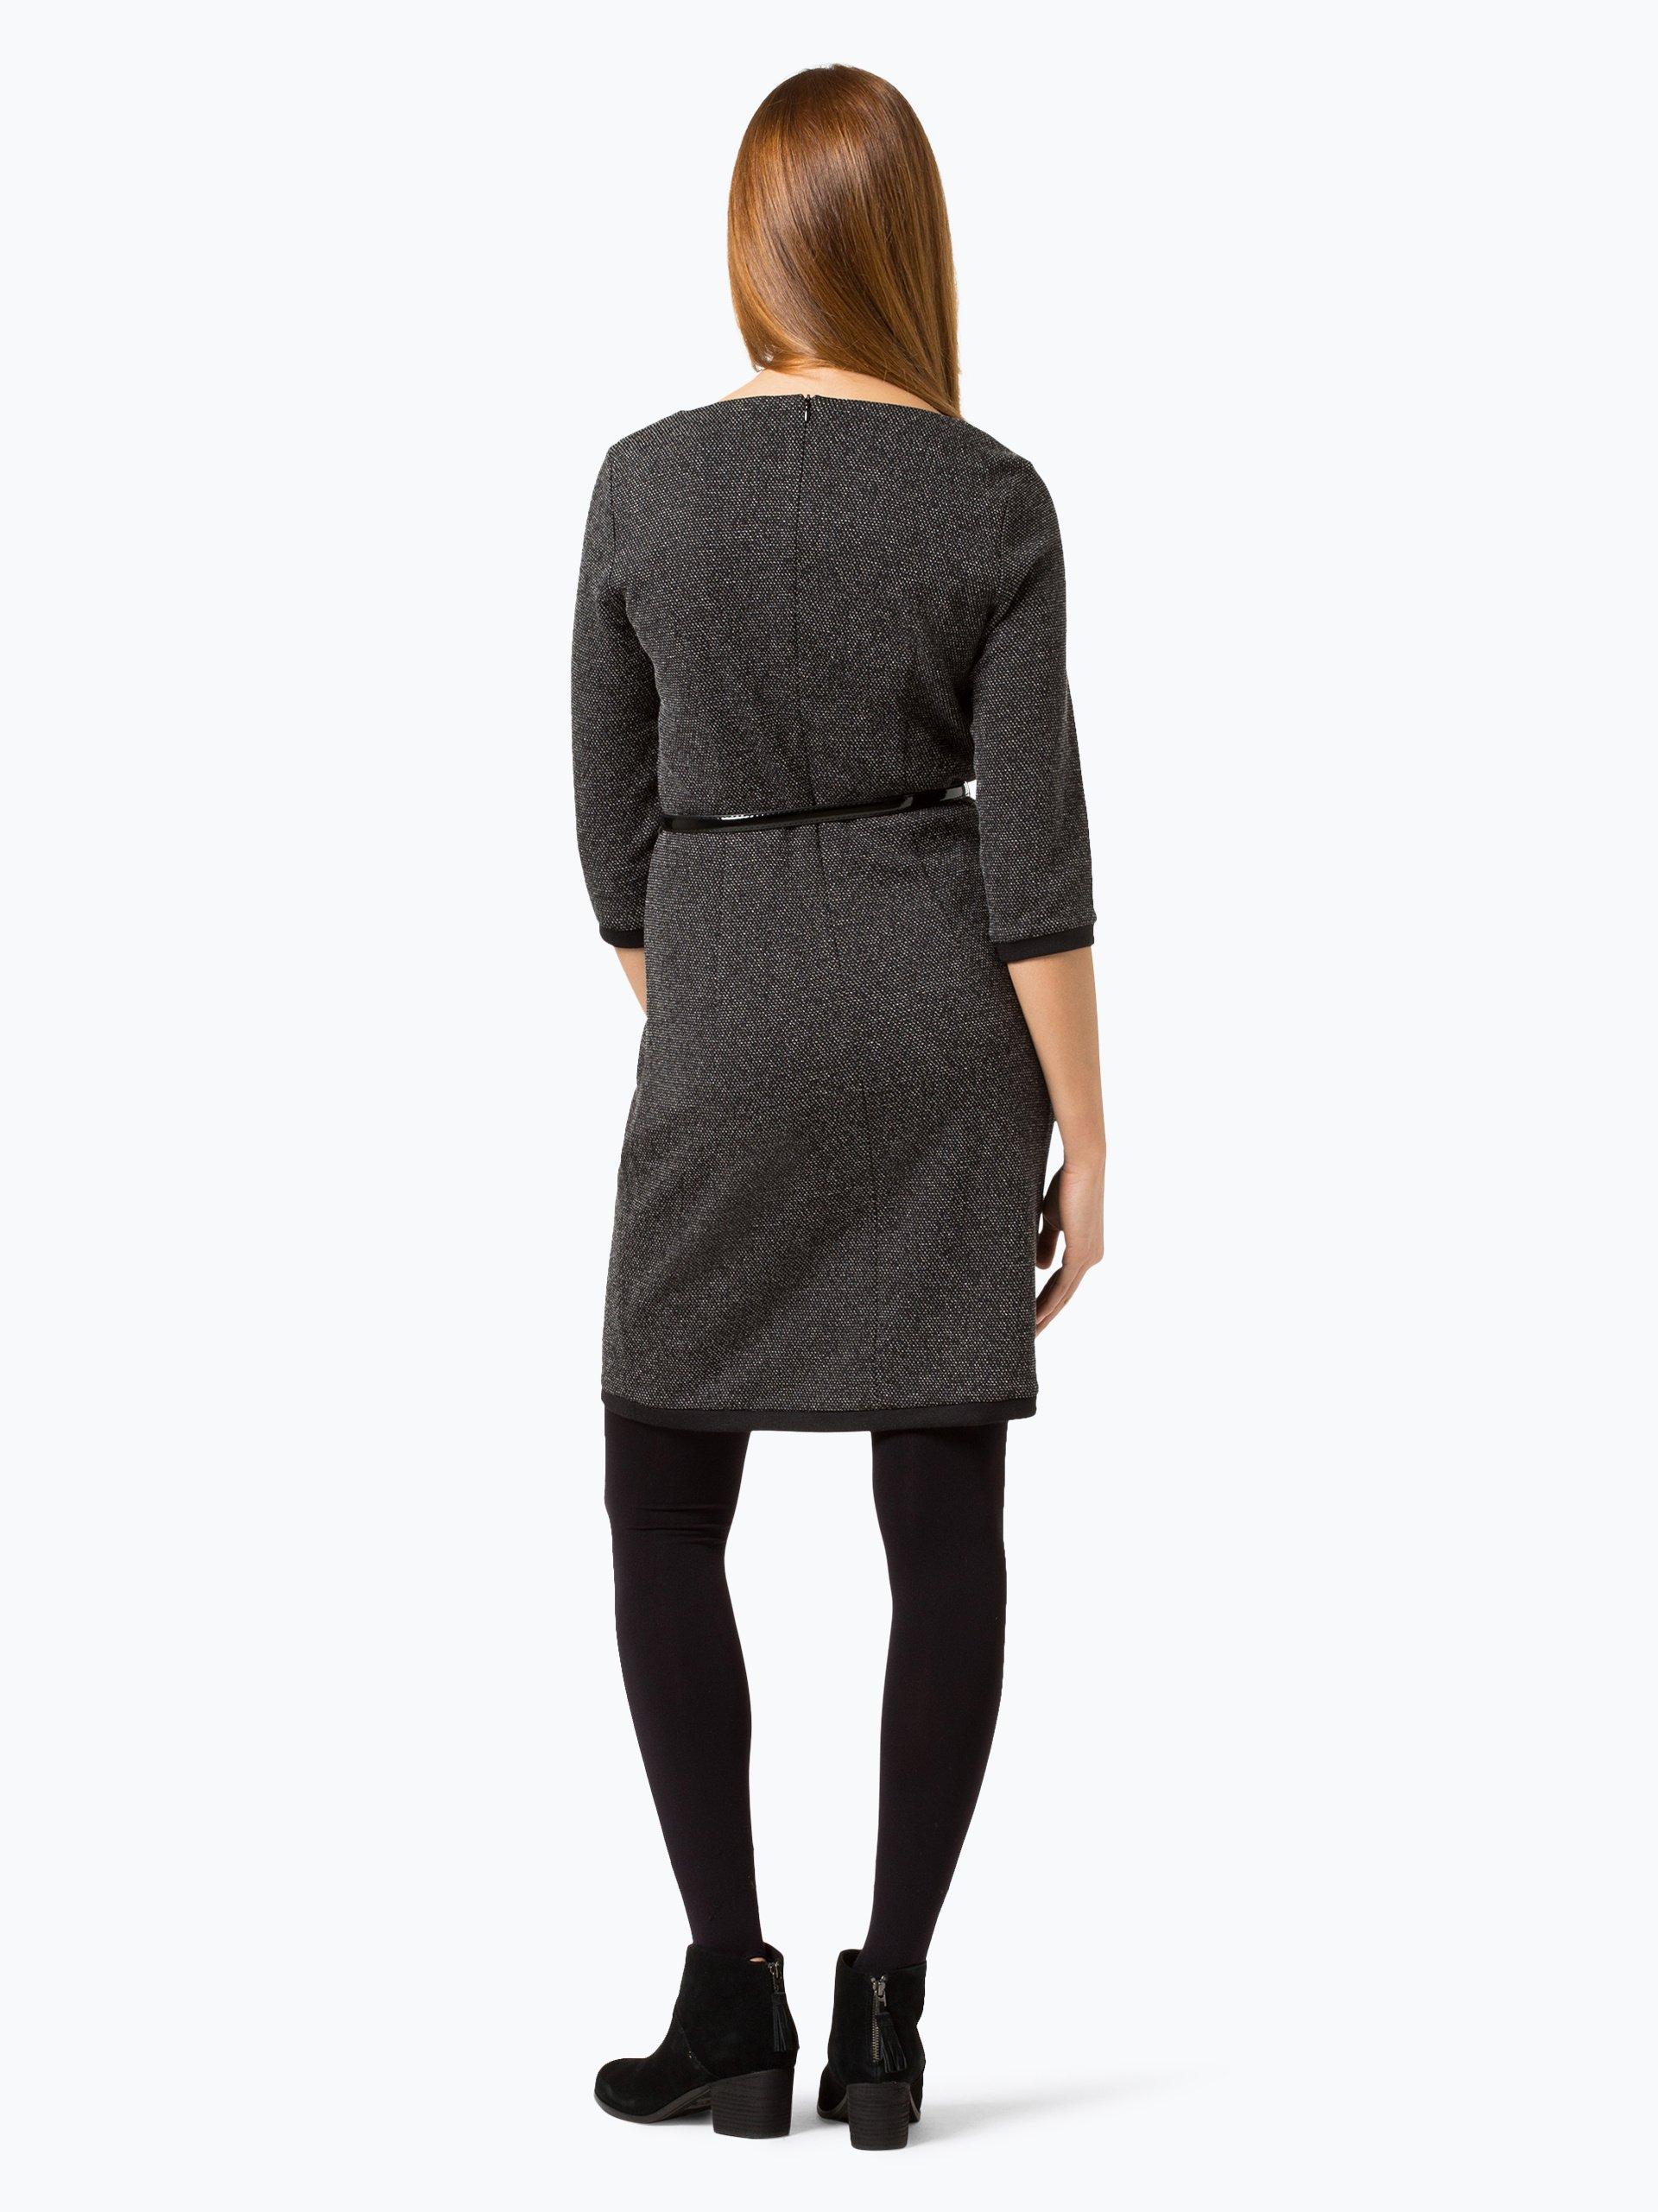 esprit collection damen kleid anthrazit uni online kaufen. Black Bedroom Furniture Sets. Home Design Ideas